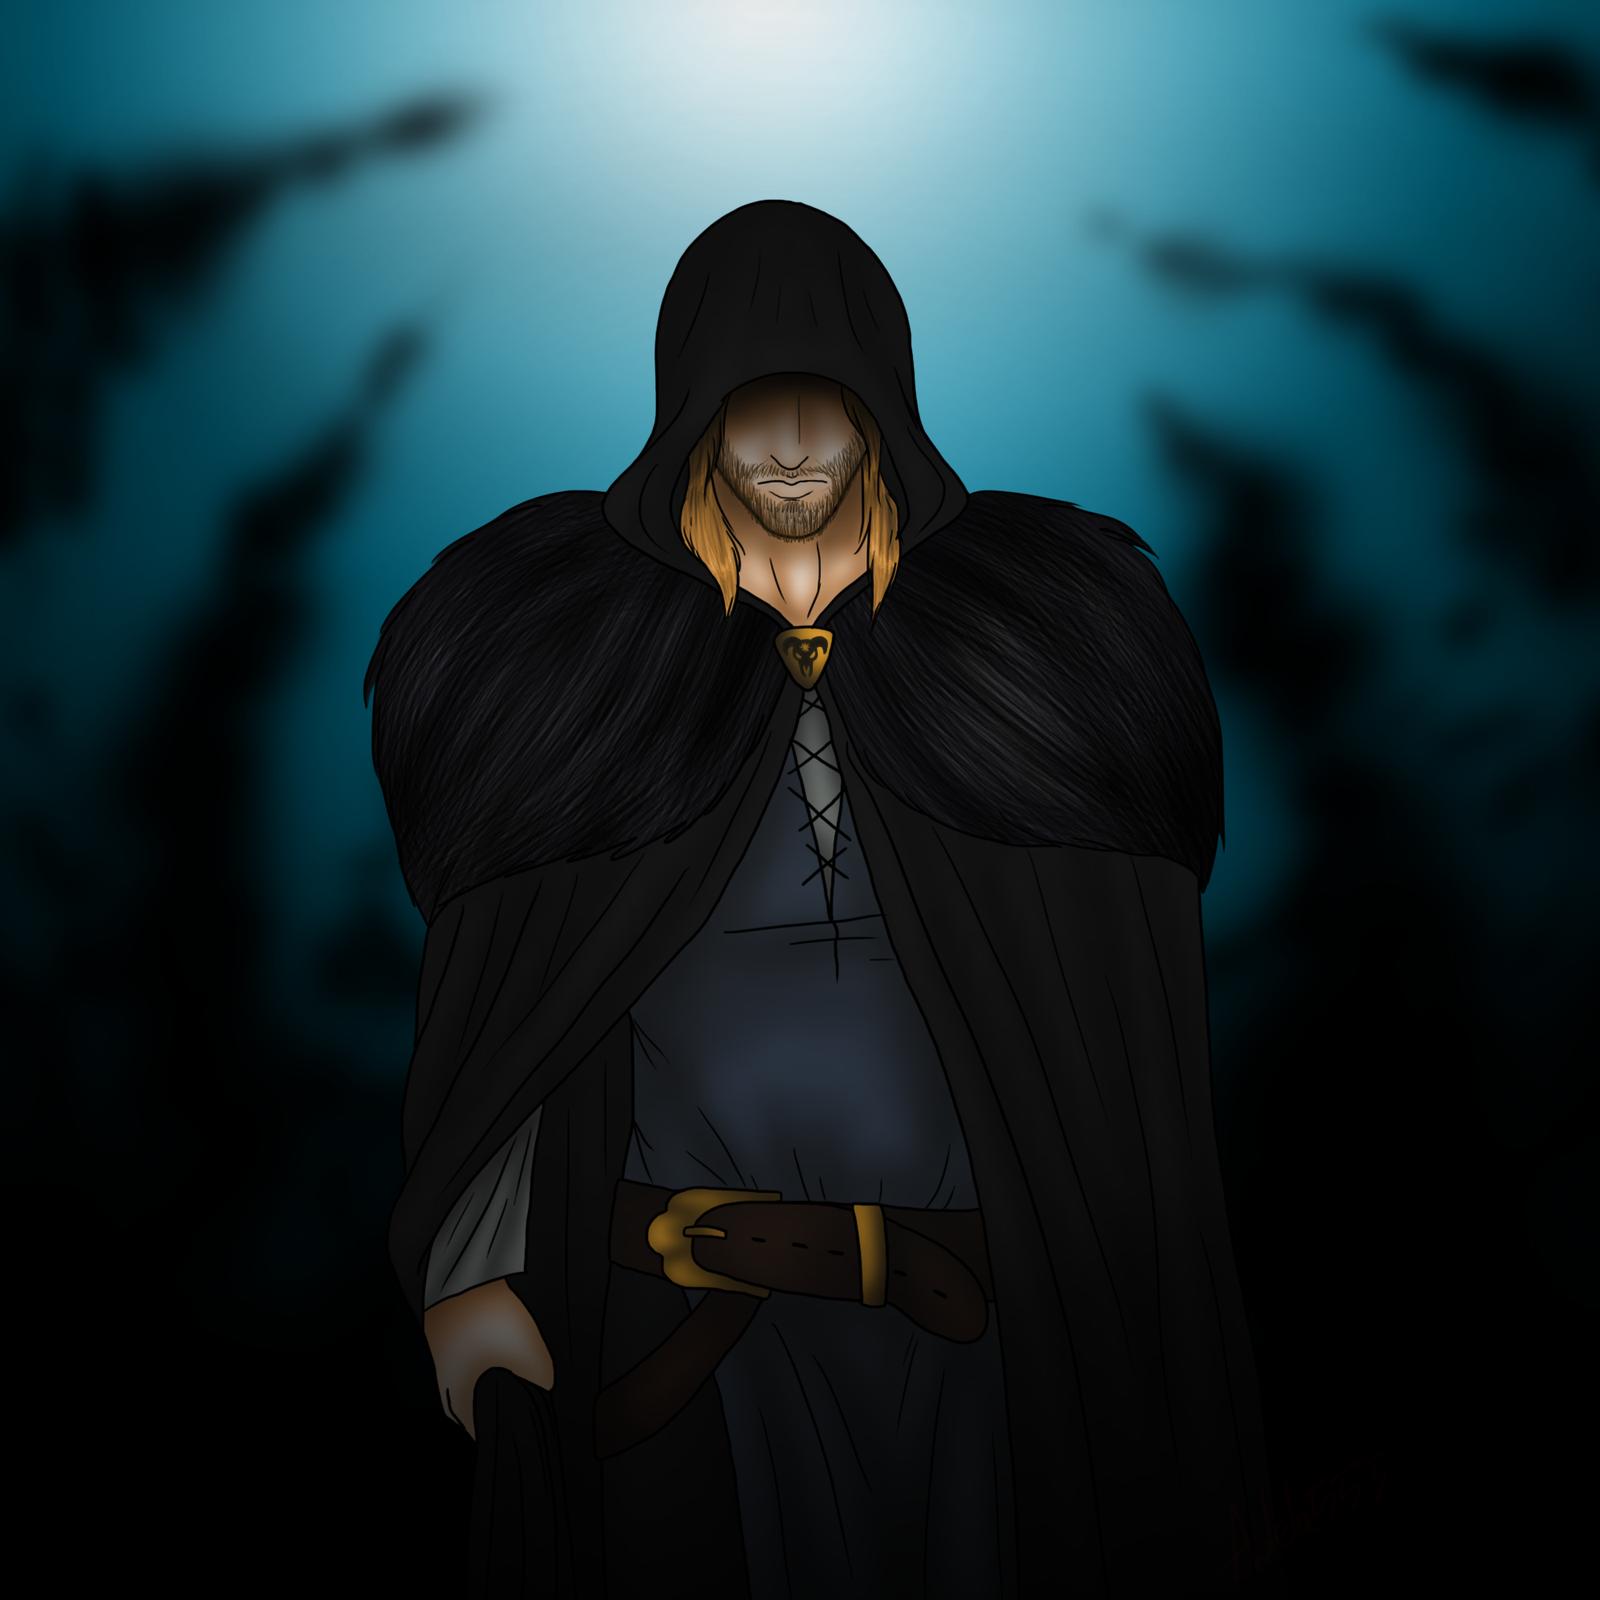 Dark times by Adela555